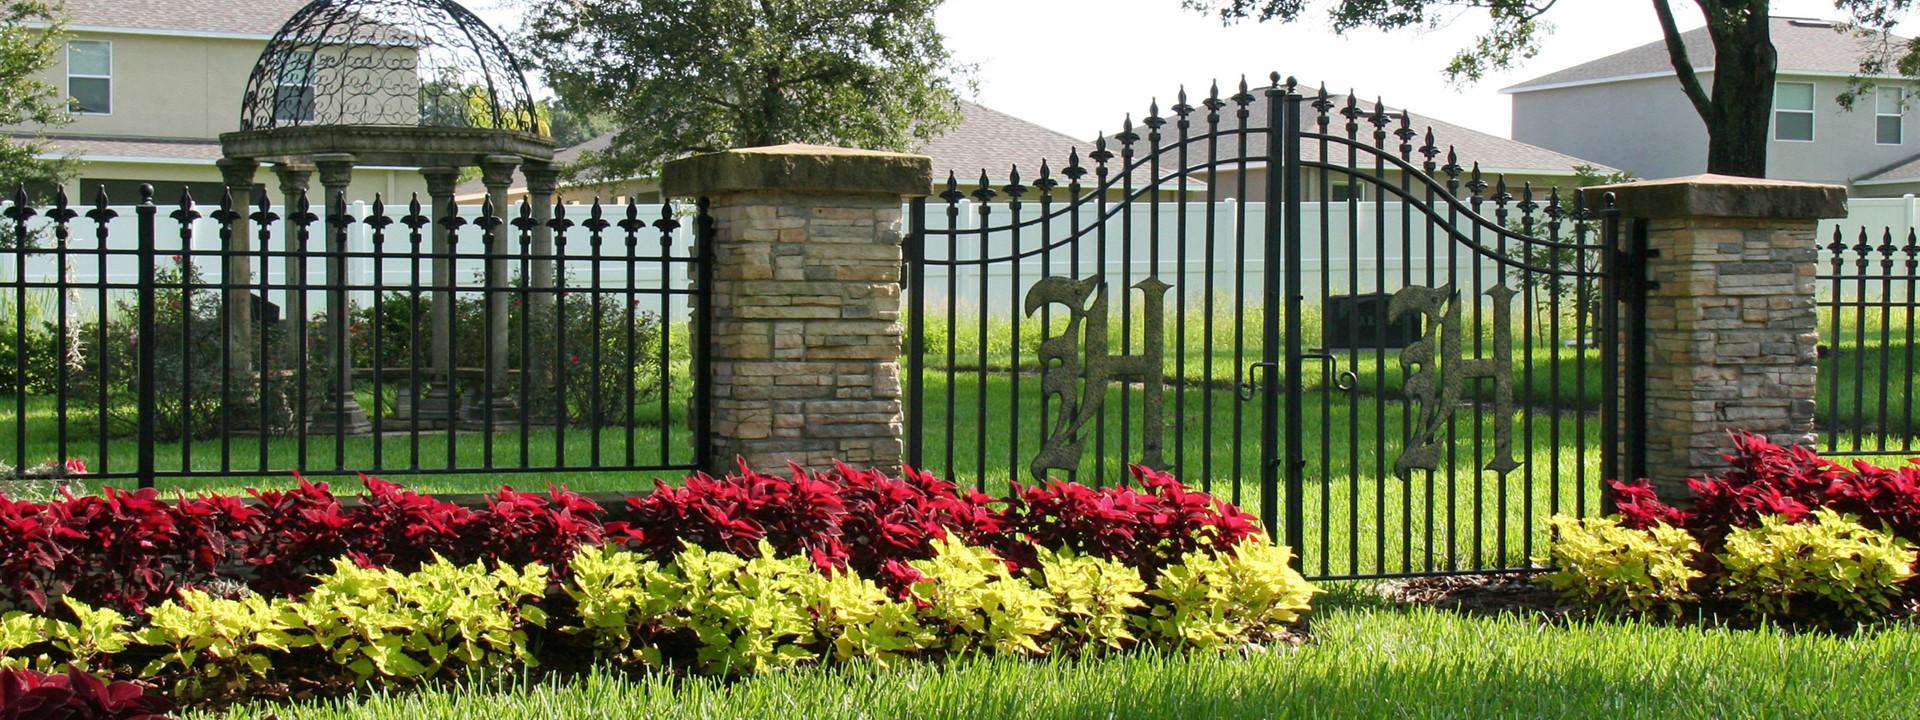 Burial Grounds | Serenity Gardens